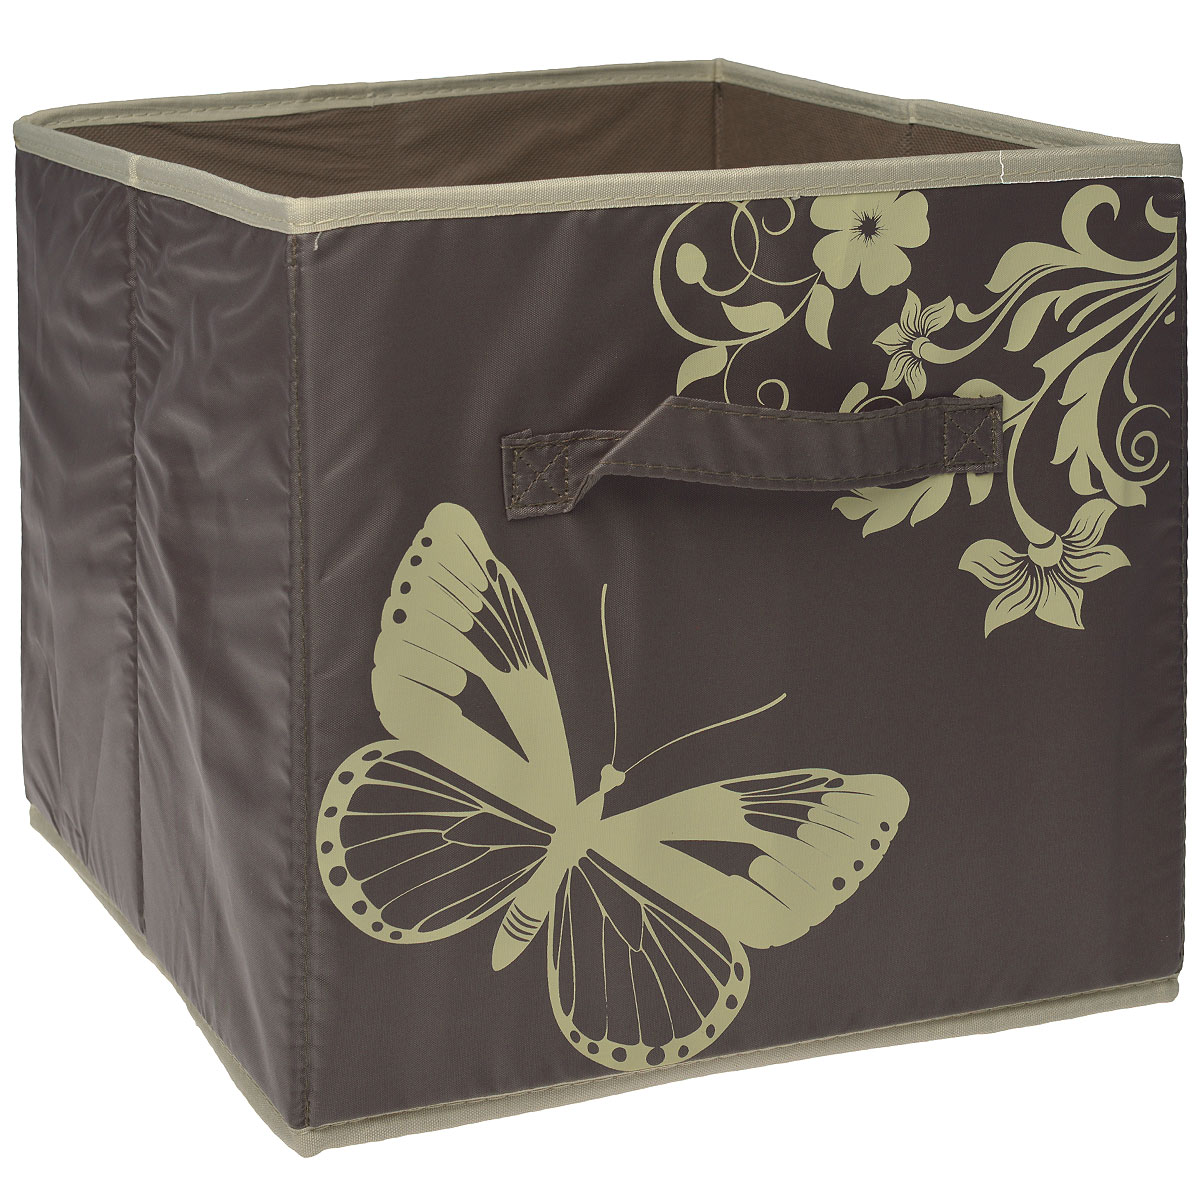 Ящик для хранения Hausmann, без крышки, цвет: коричневый, 31 x 34 x 29,5 см ящик для хранения белья hausmann 30х35х11 см